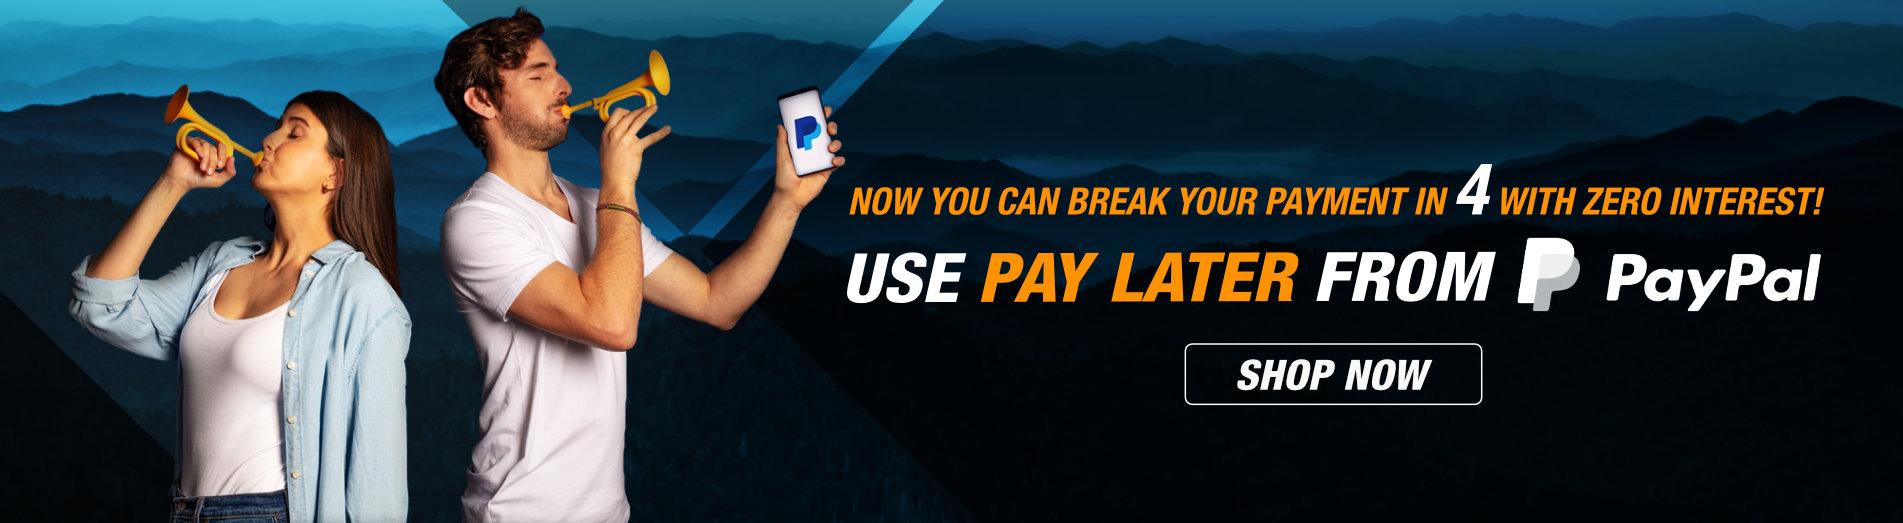 Break your payment in 4 with zero interest!